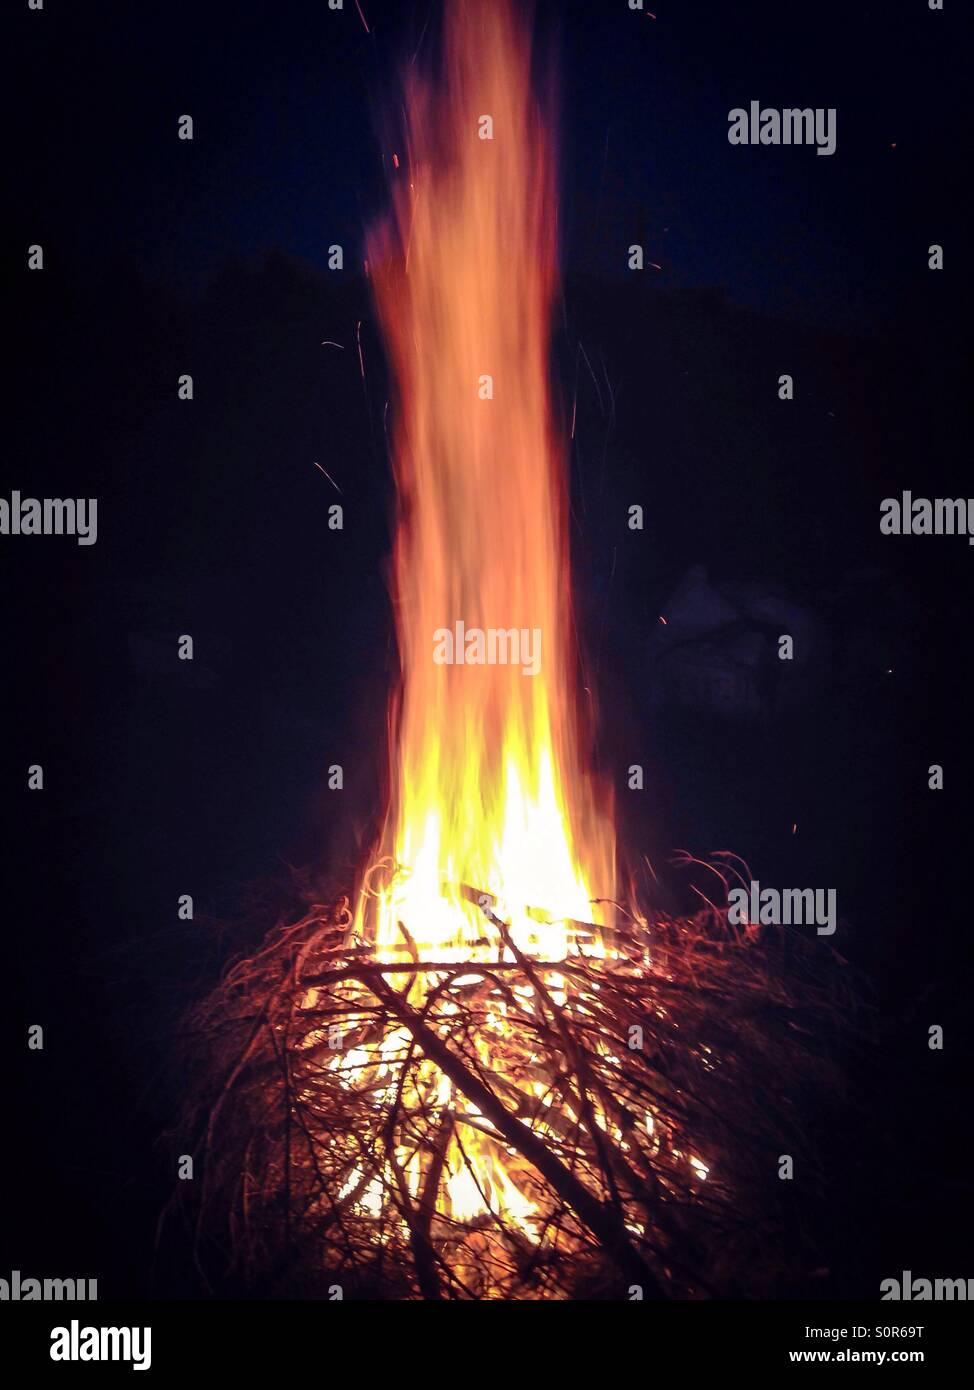 Bonfire - Stock Image